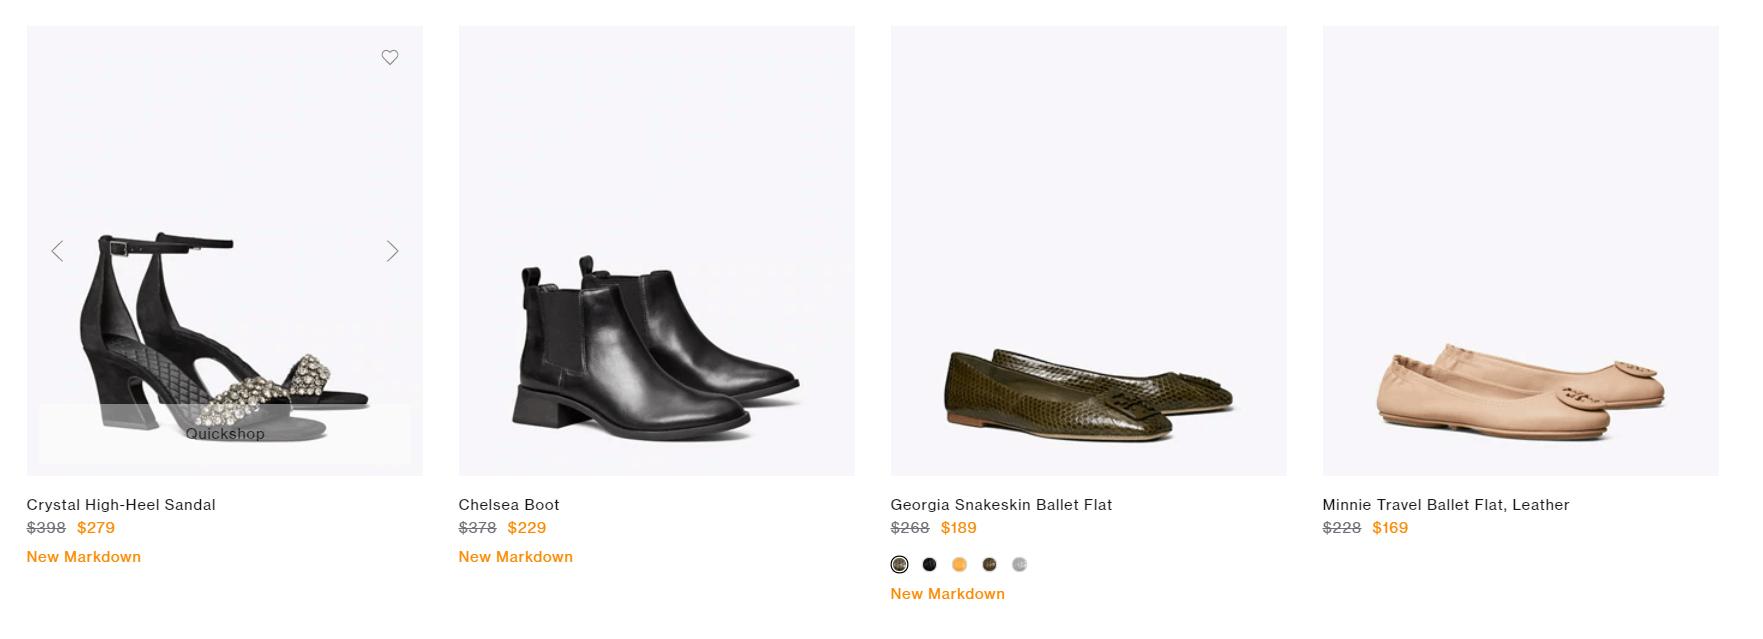 Rebatesme 回贈網獨家Tory Burch優惠連結 多款OL人氣袋款、鞋款有折!